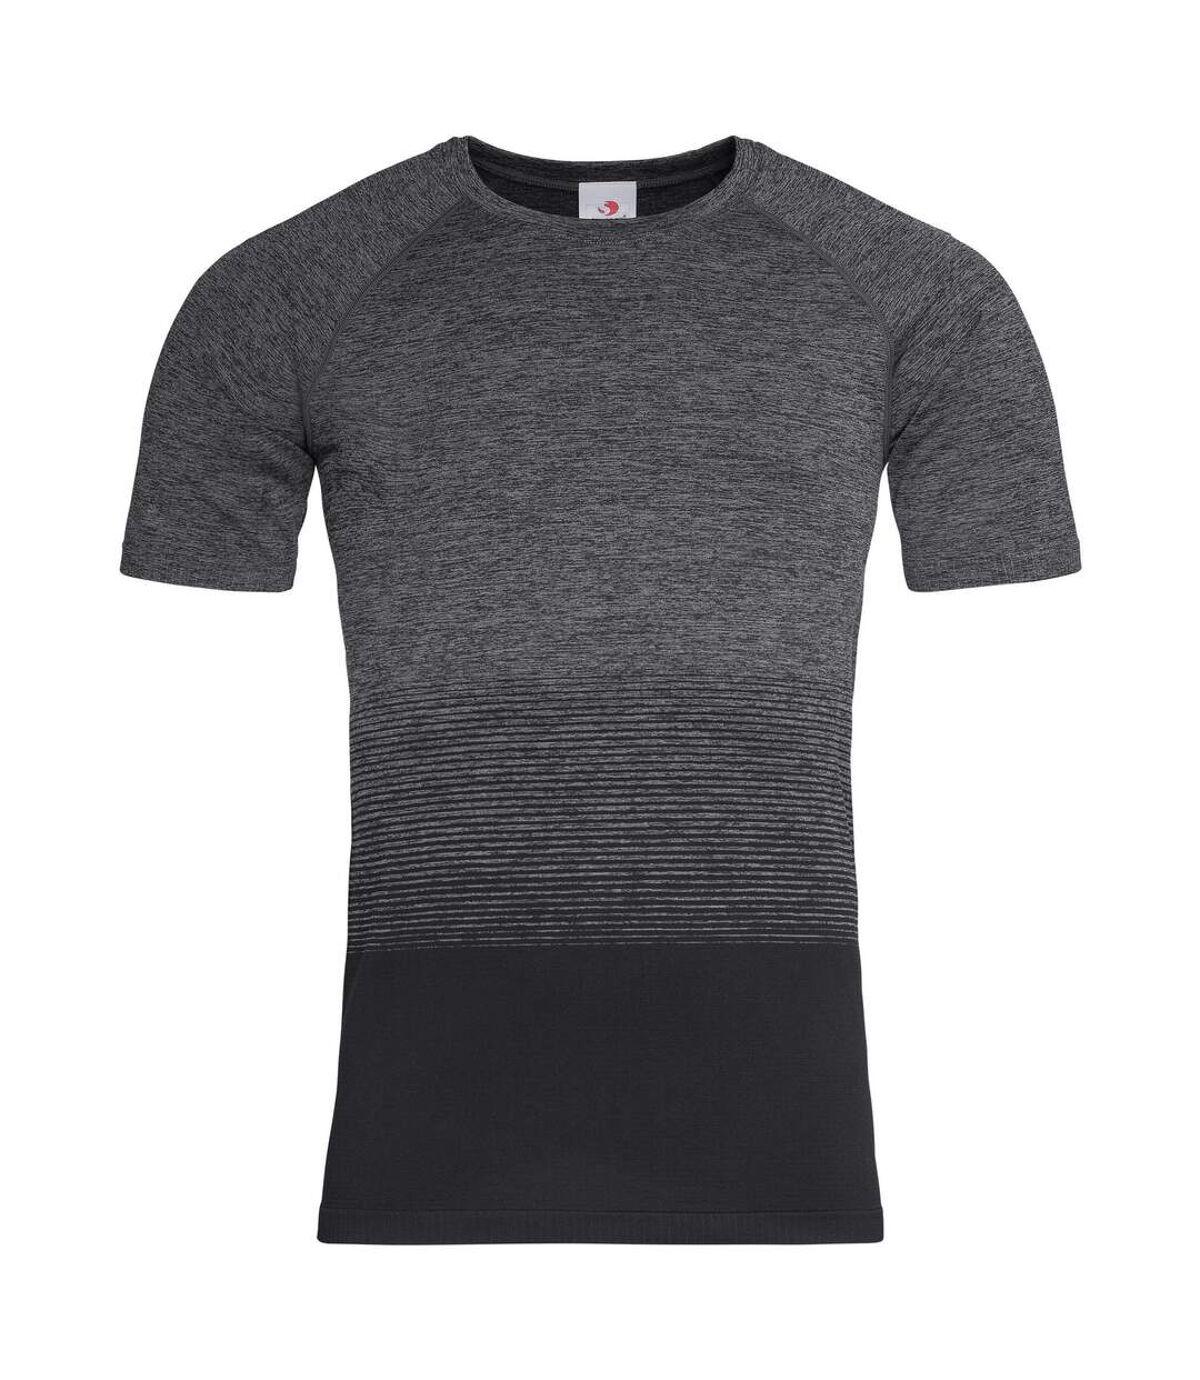 Stedman Mens Active Seamless Raglan Flow T-Shirt (Dark Grey Transition) - UTAB461